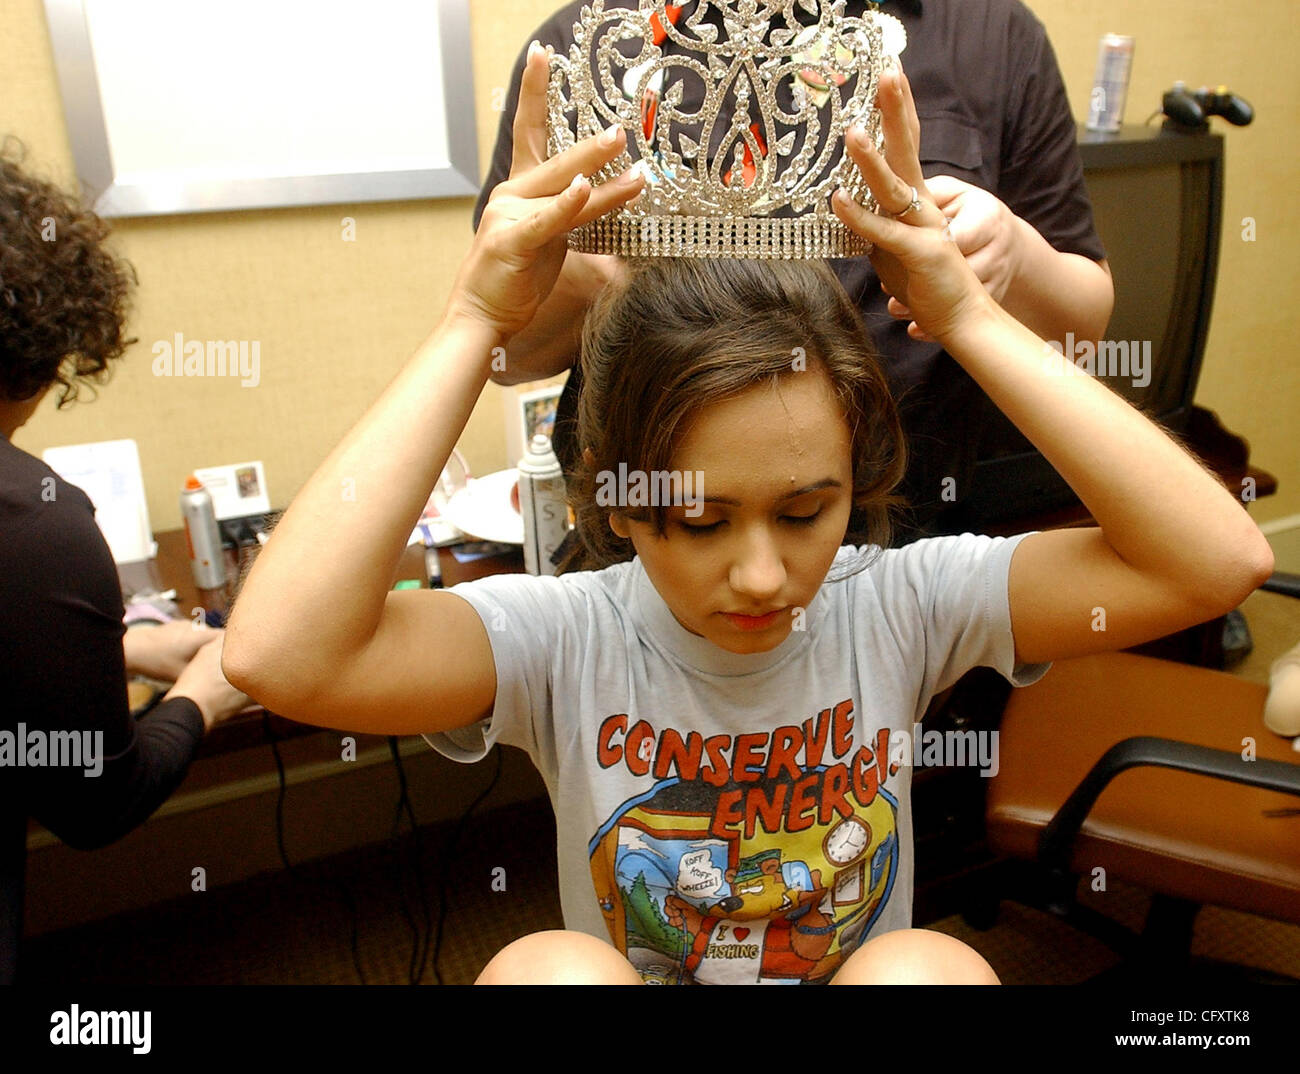 Apr 27, 2007 - San Antonio, TX, USA - Miss Fiesta San